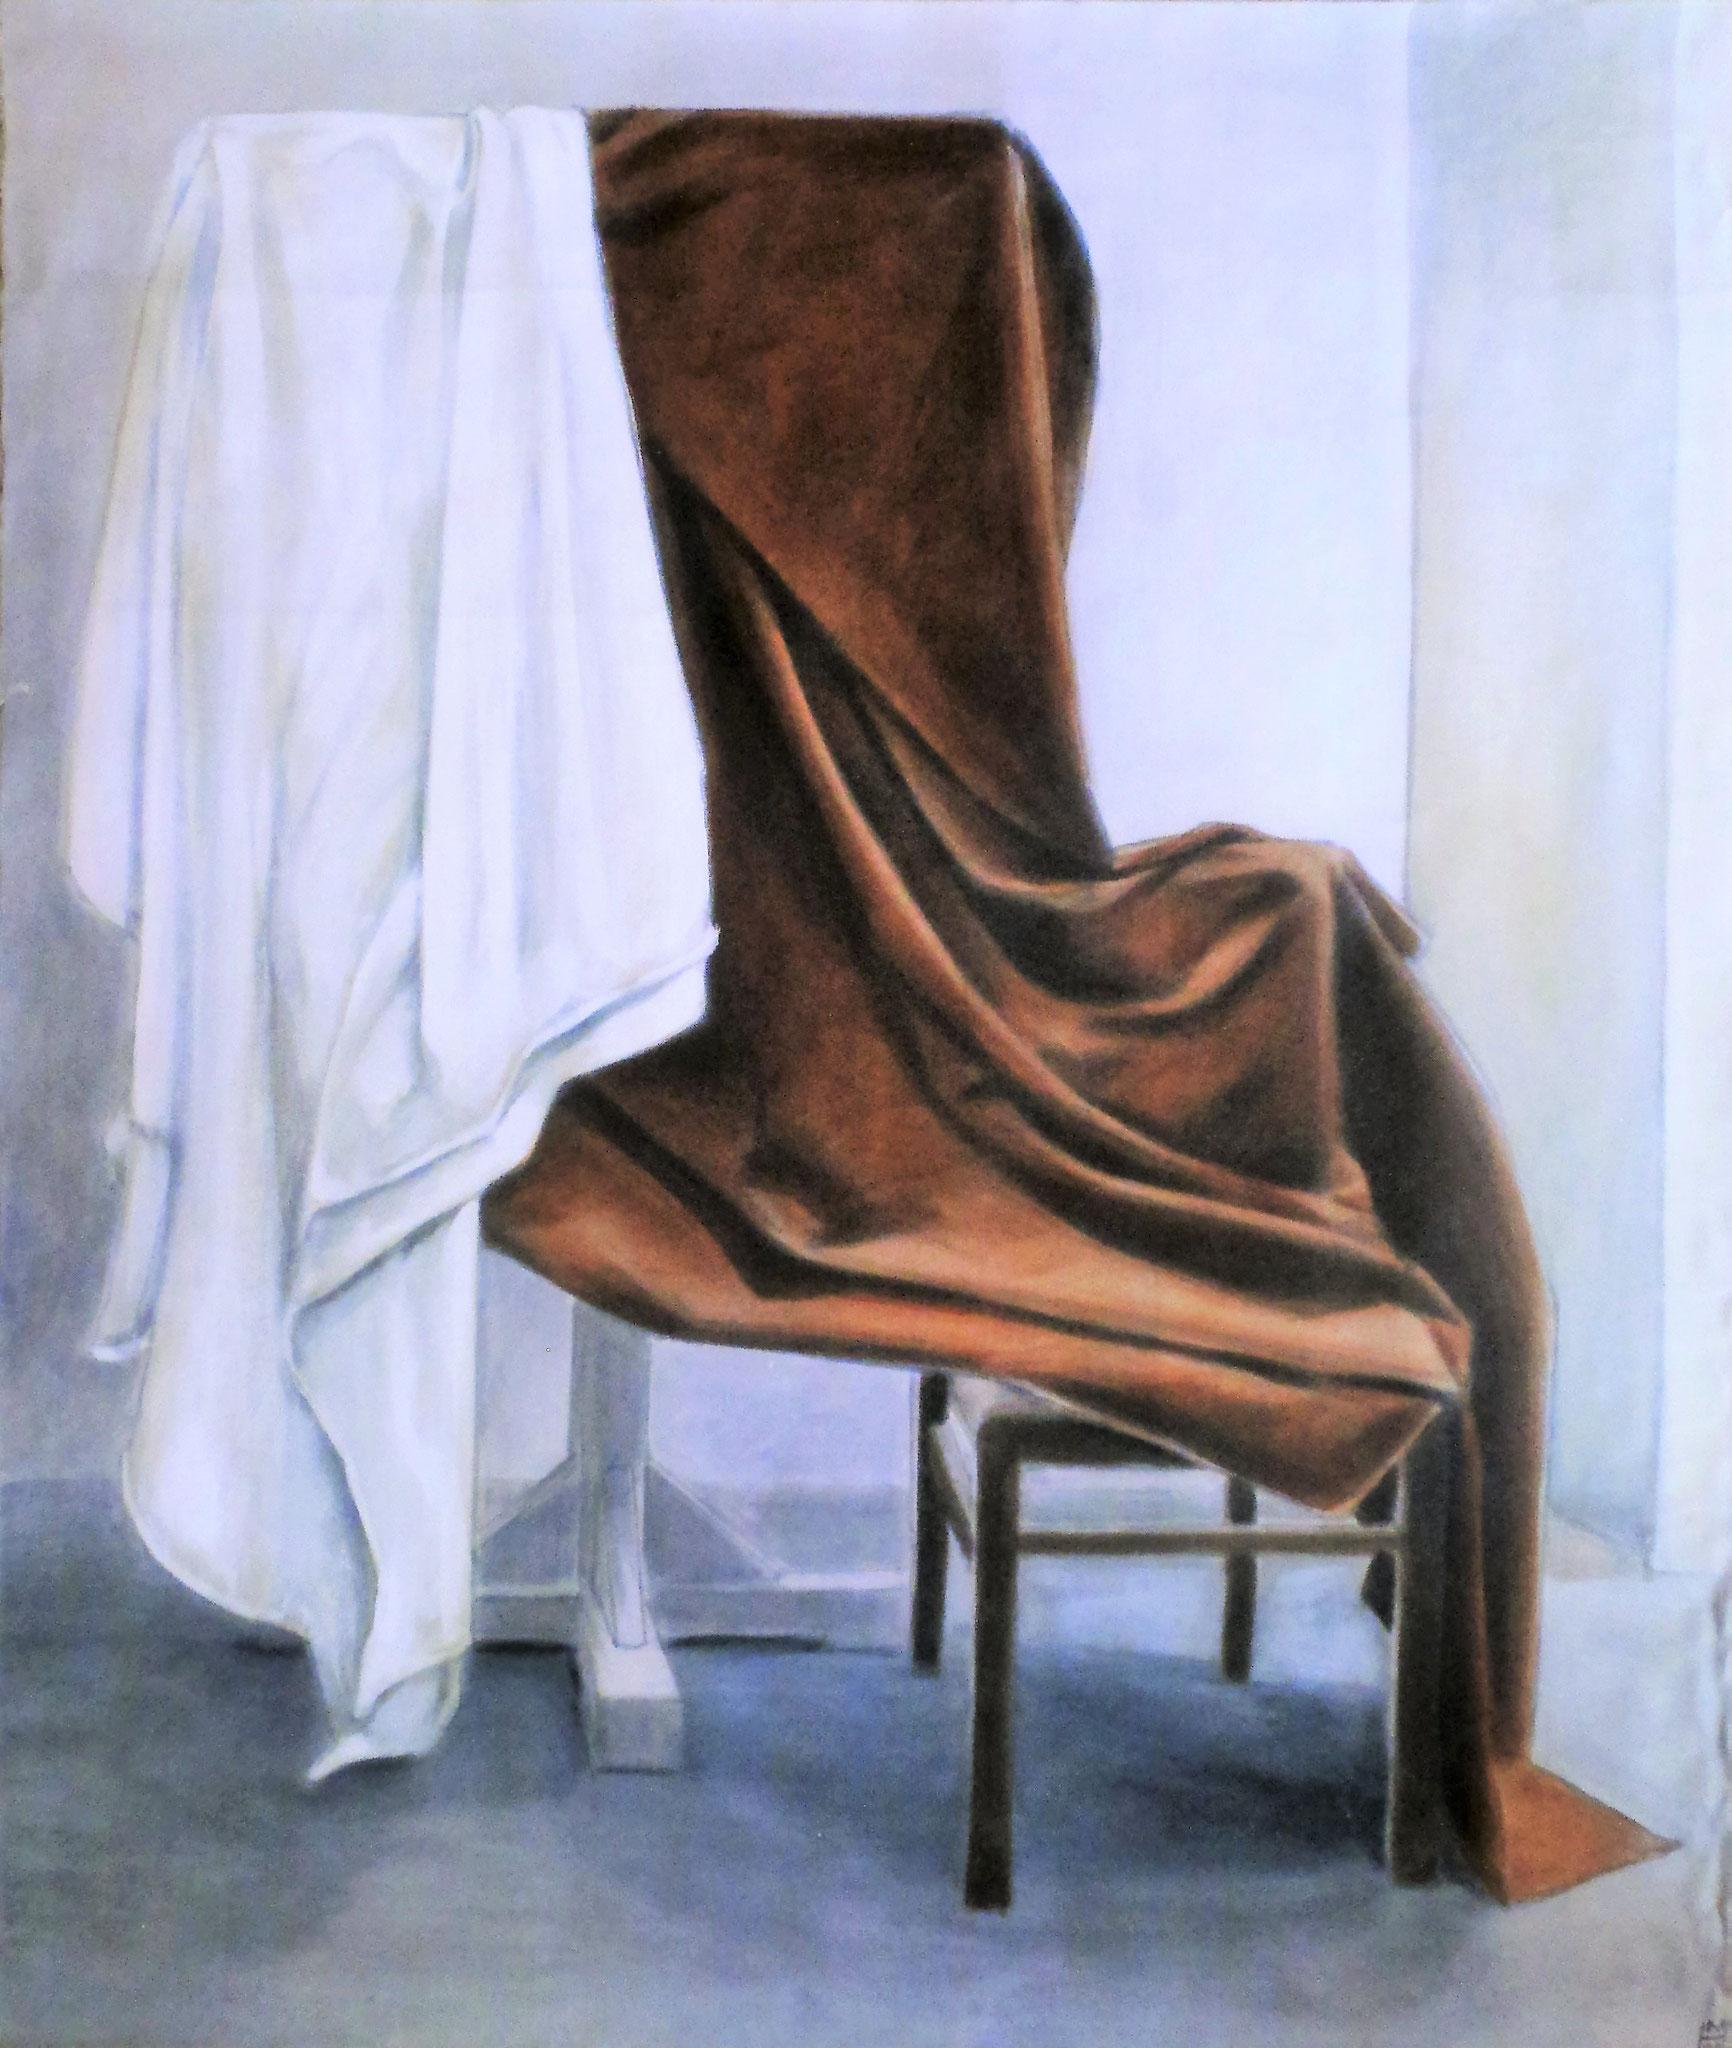 Faltenwurf, Akryl auf Leinwand, 120 x 140 cm